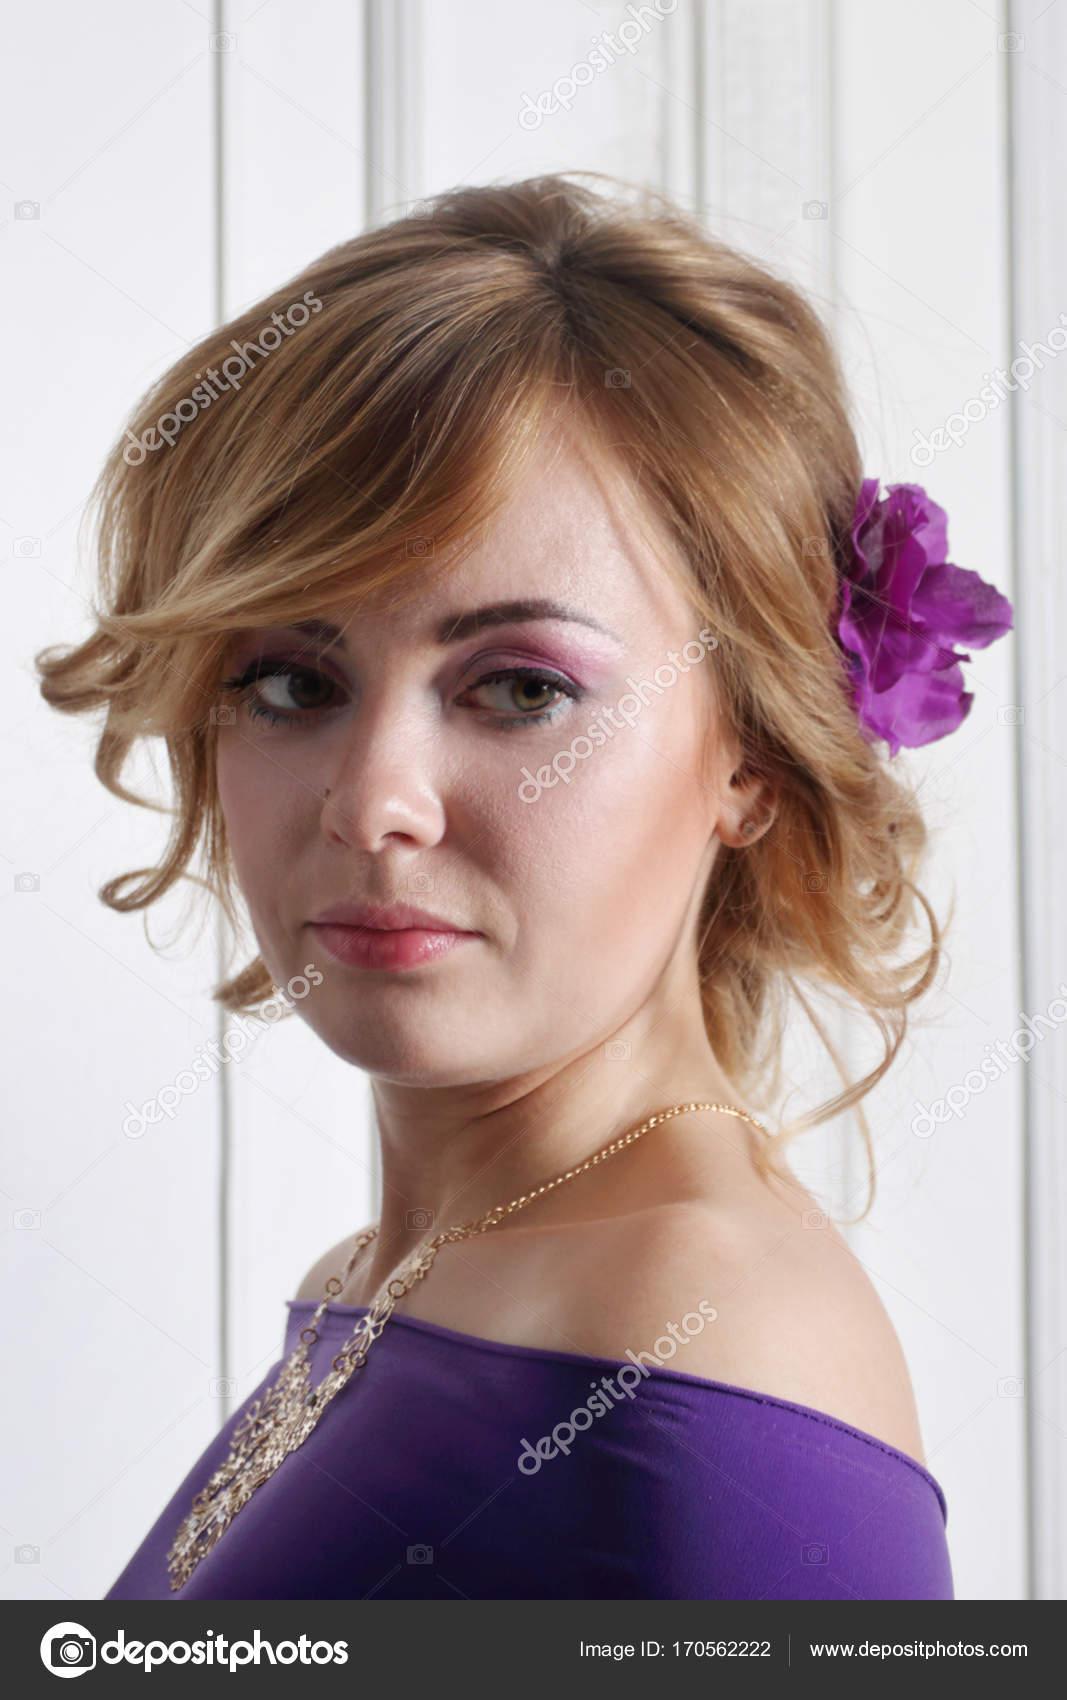 a837aab1447f Όμορφη νεαρή ξανθιά γυναίκα με καθαρό δέρμα και η make-up — Φωτογραφία  Αρχείου